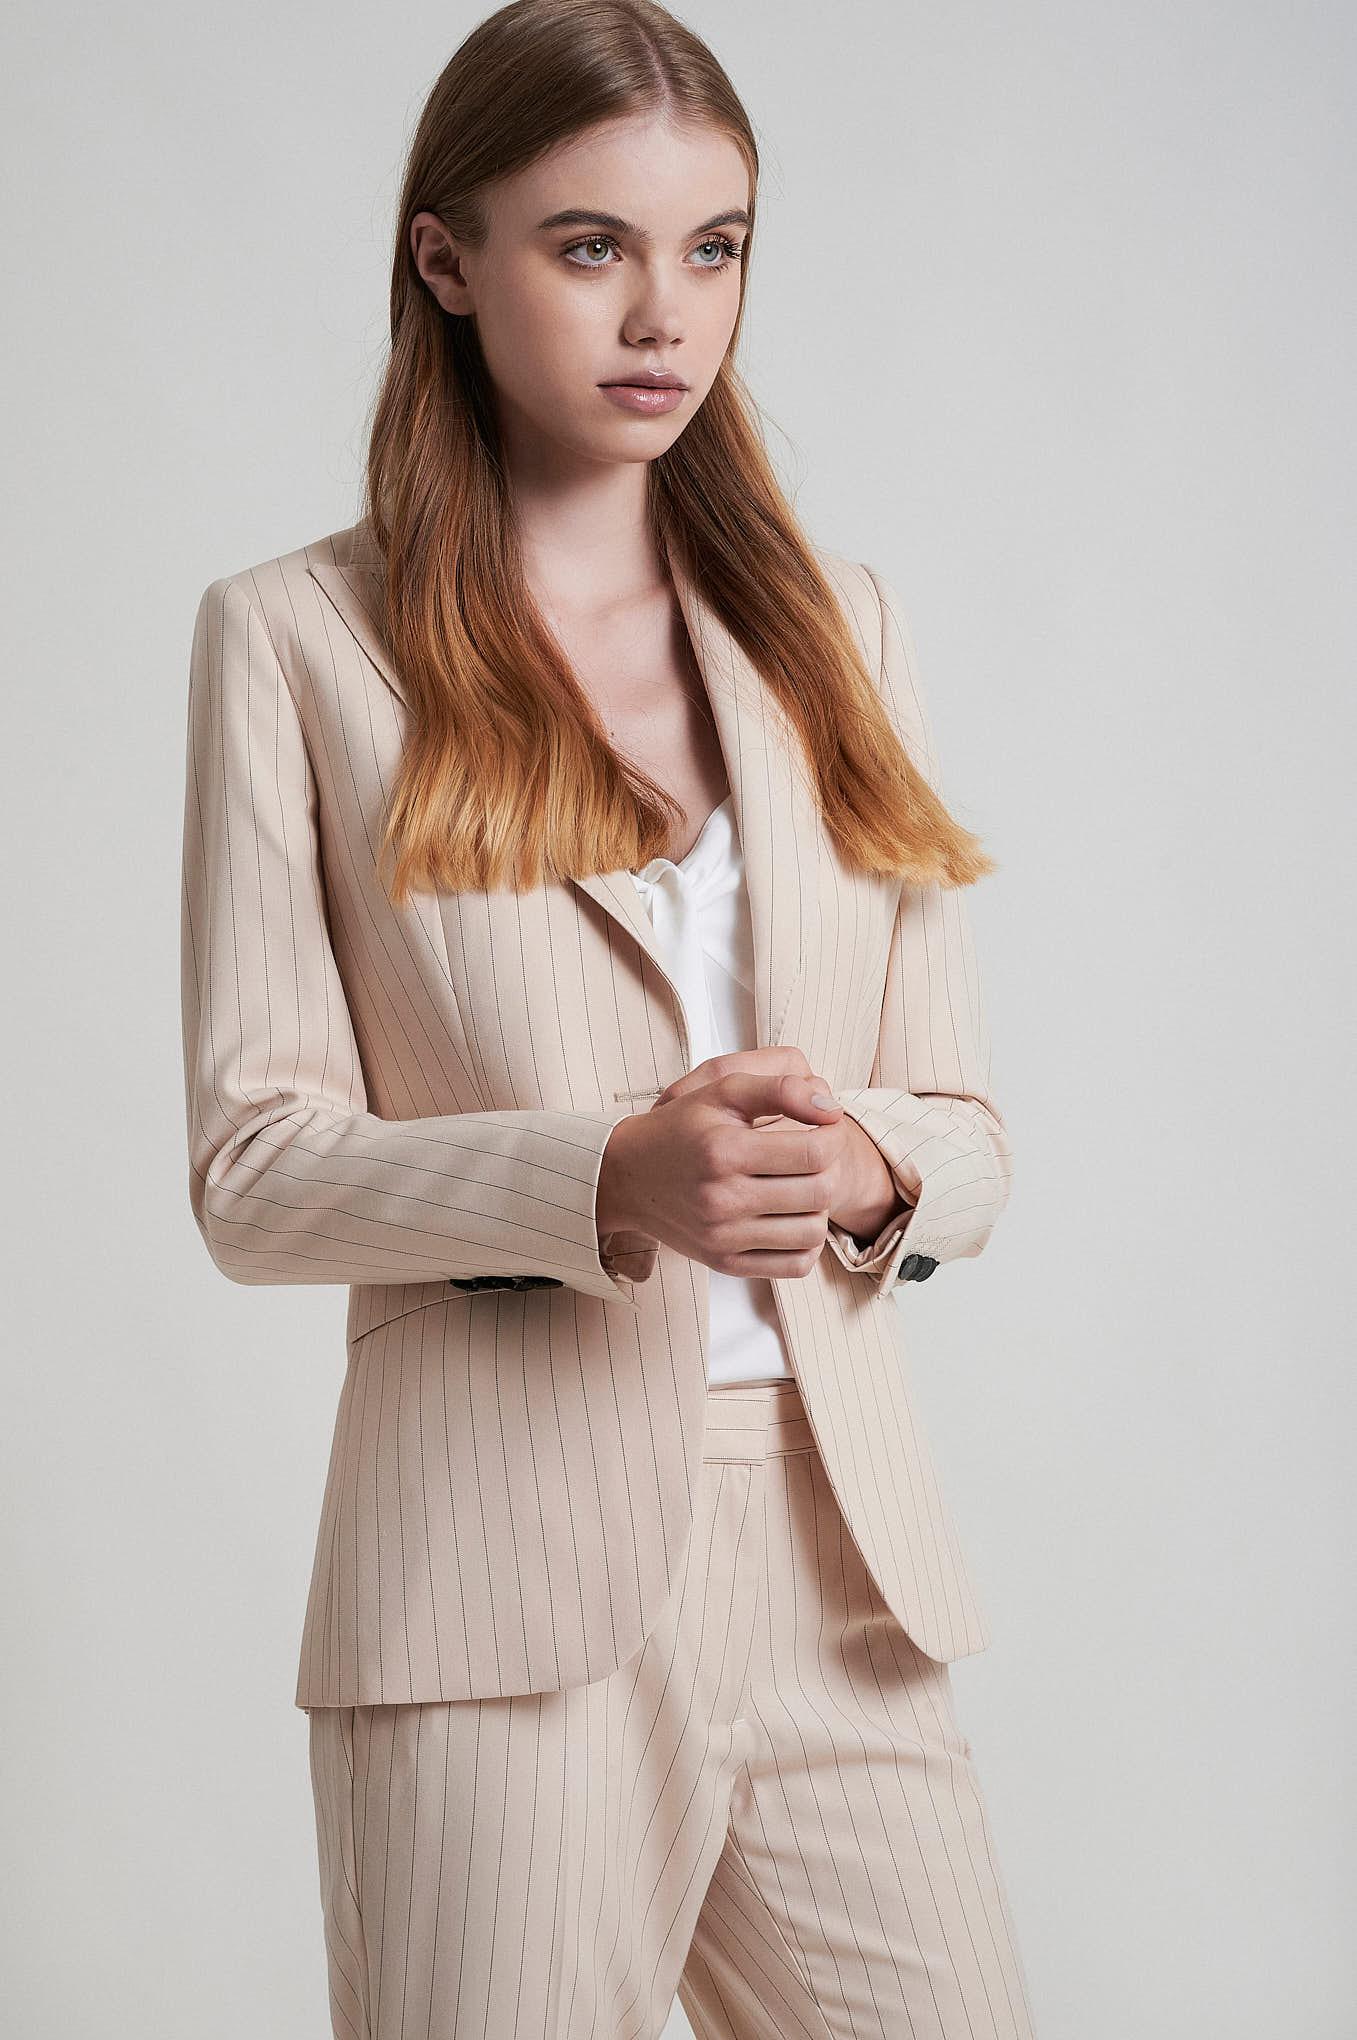 Suit Light Beige Formal Woman